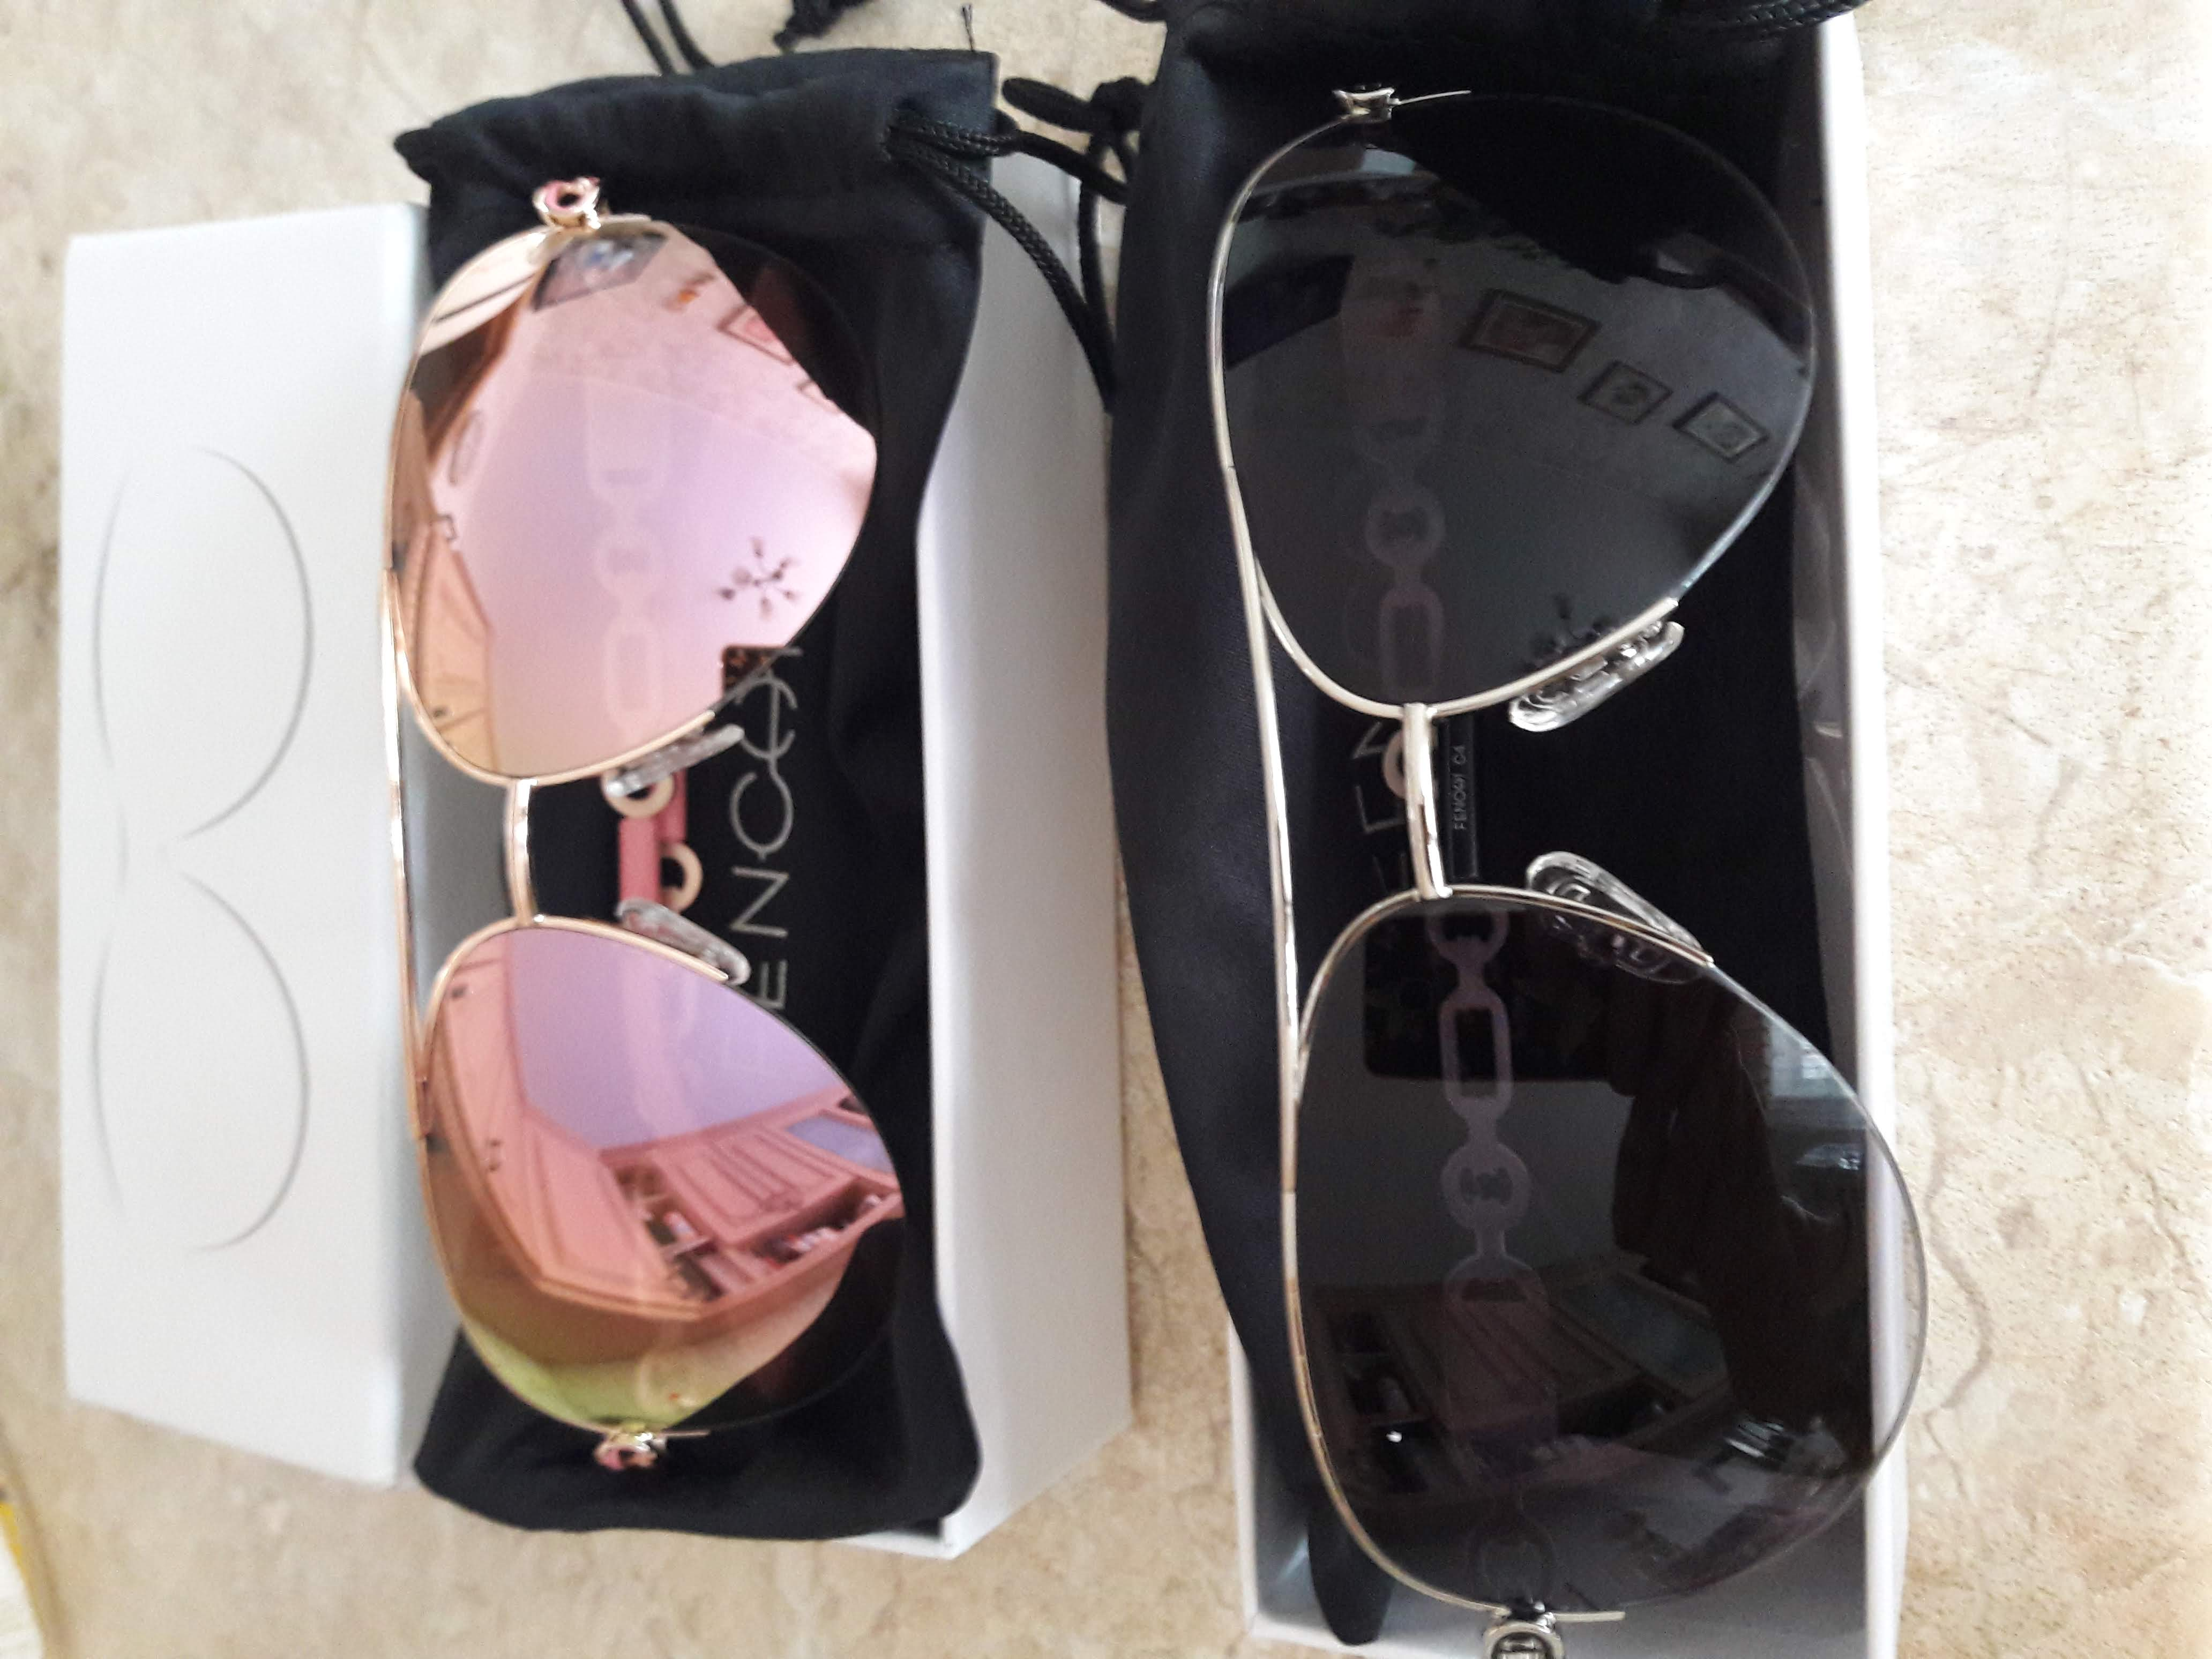 FENCHI sunglasses women uv 400 oculos female glasses sun glasses mirror Pilot Pink feminino zonnebril dames gafas de sol mujer de sol oculos de solsunglasses high quality - AliExpress